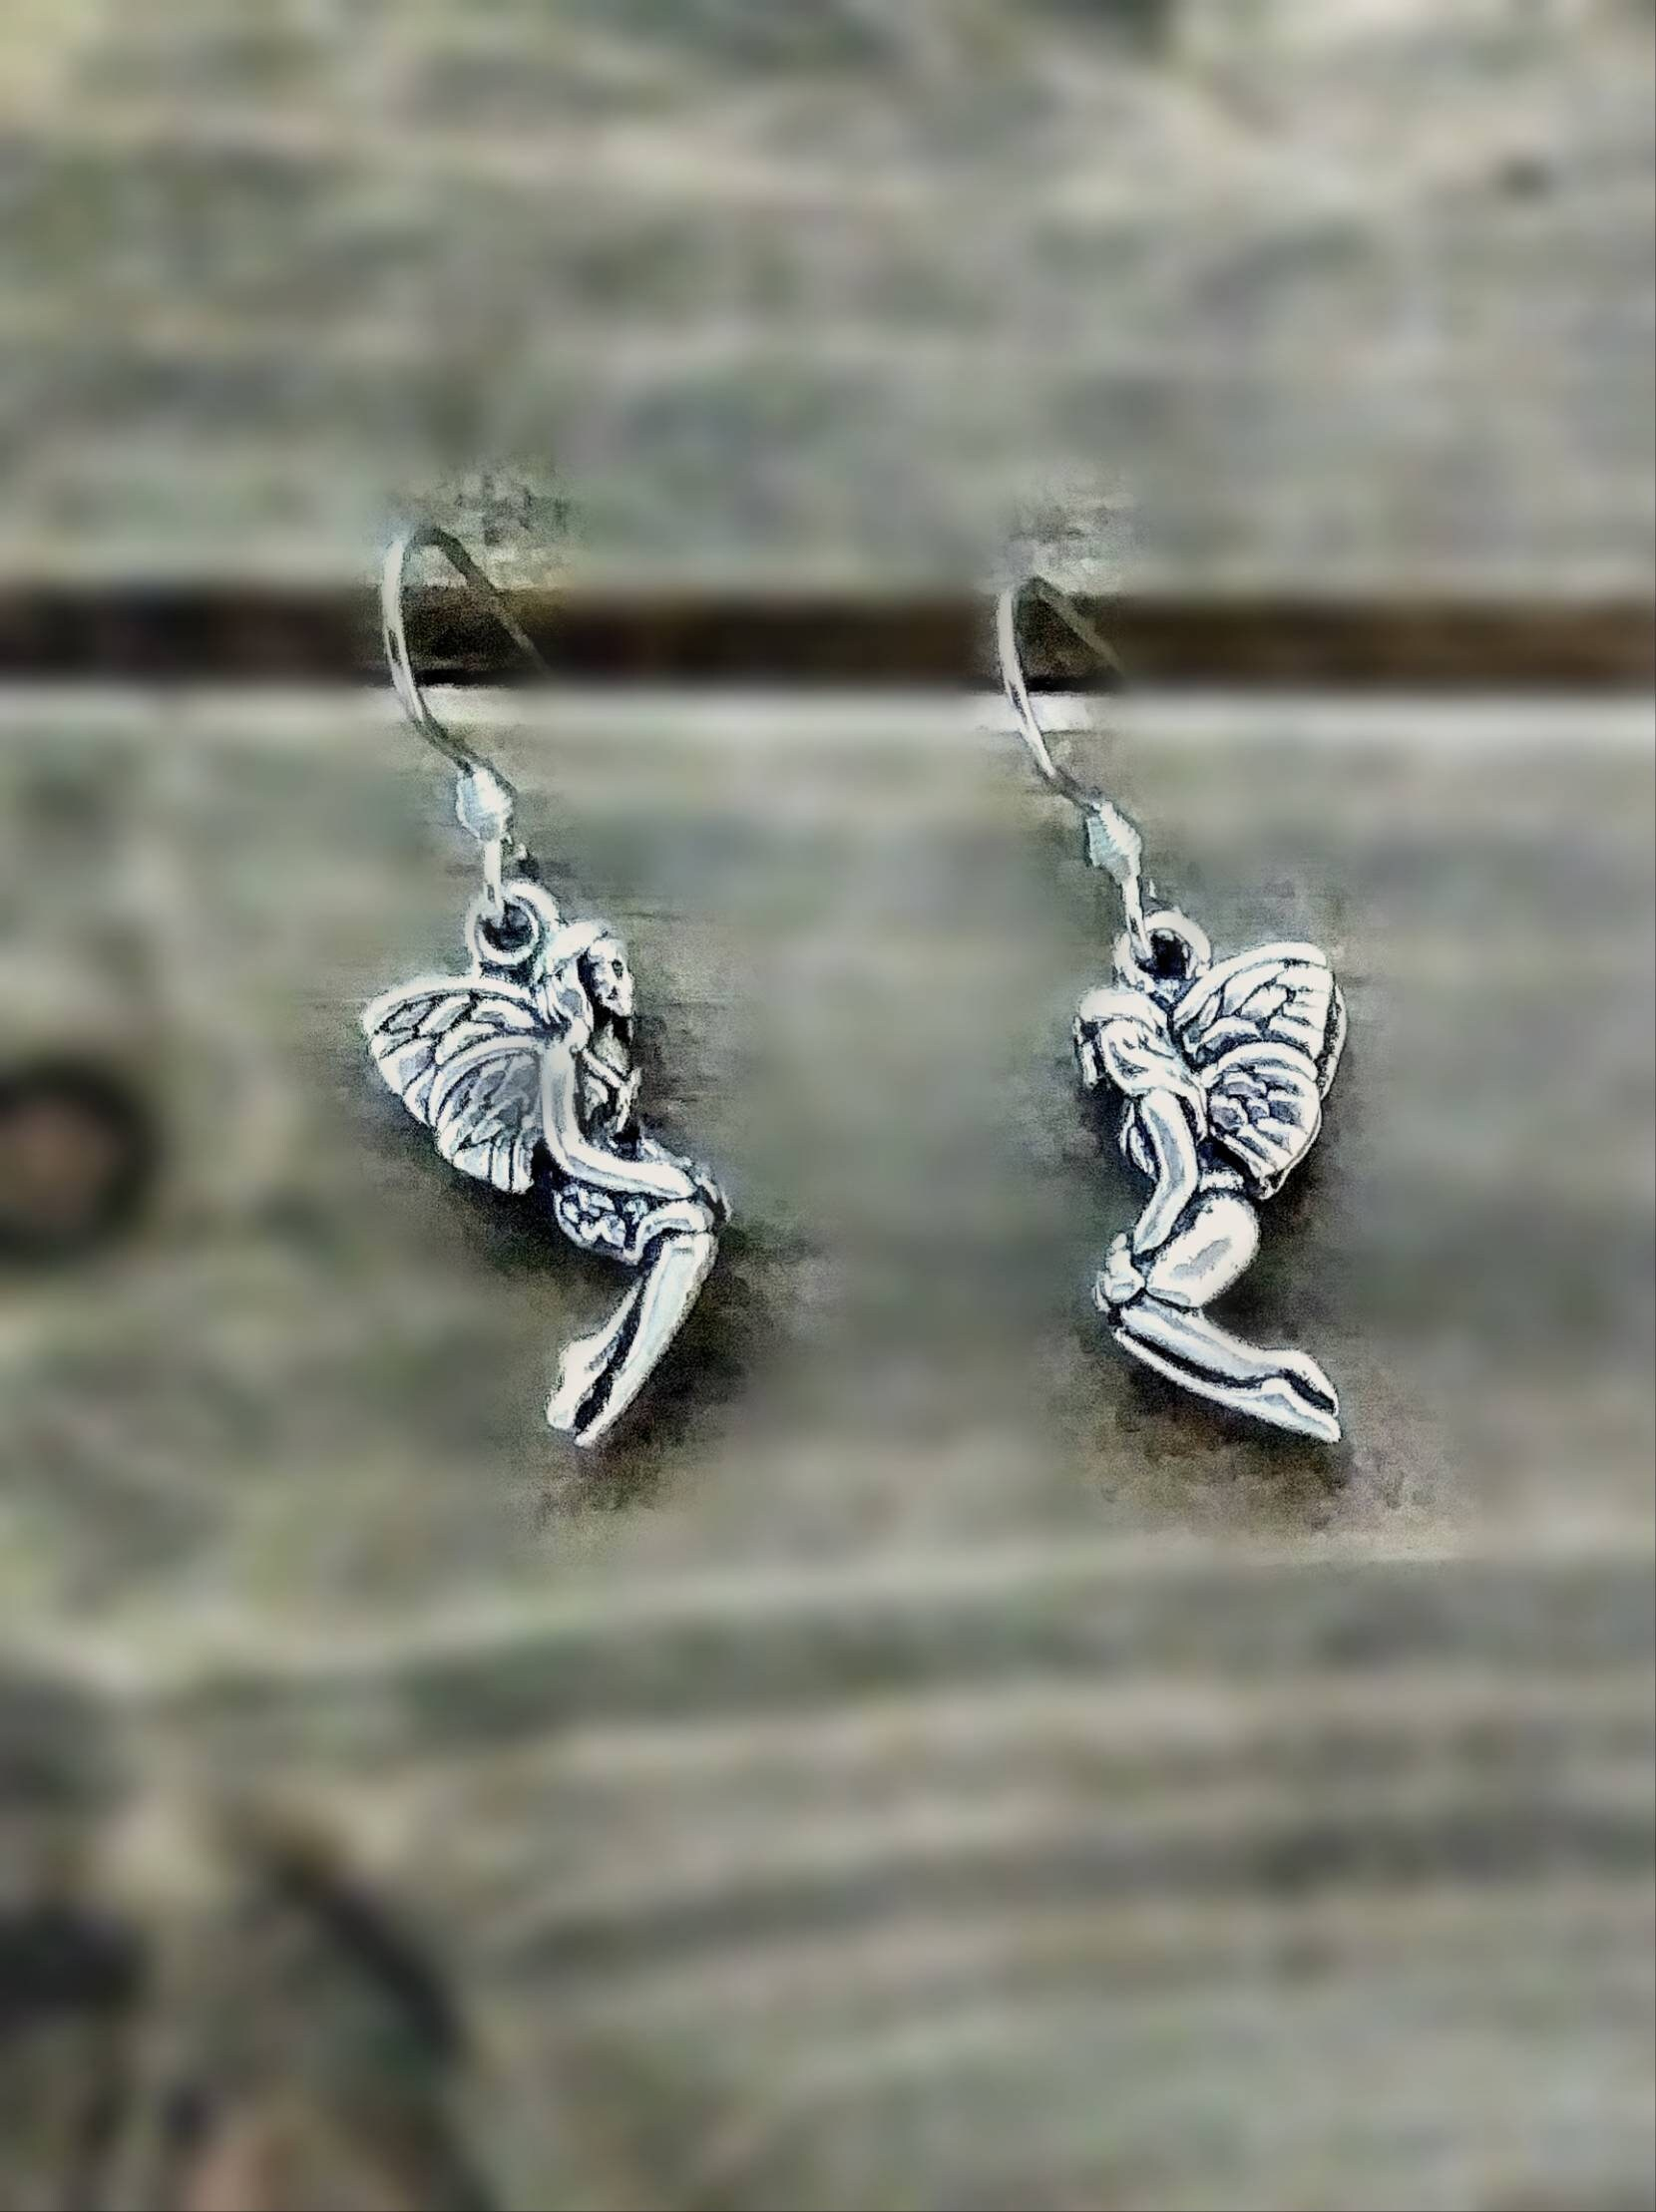 Fairy - Pewter Earrings- Stainless Steel ear wires - Kids